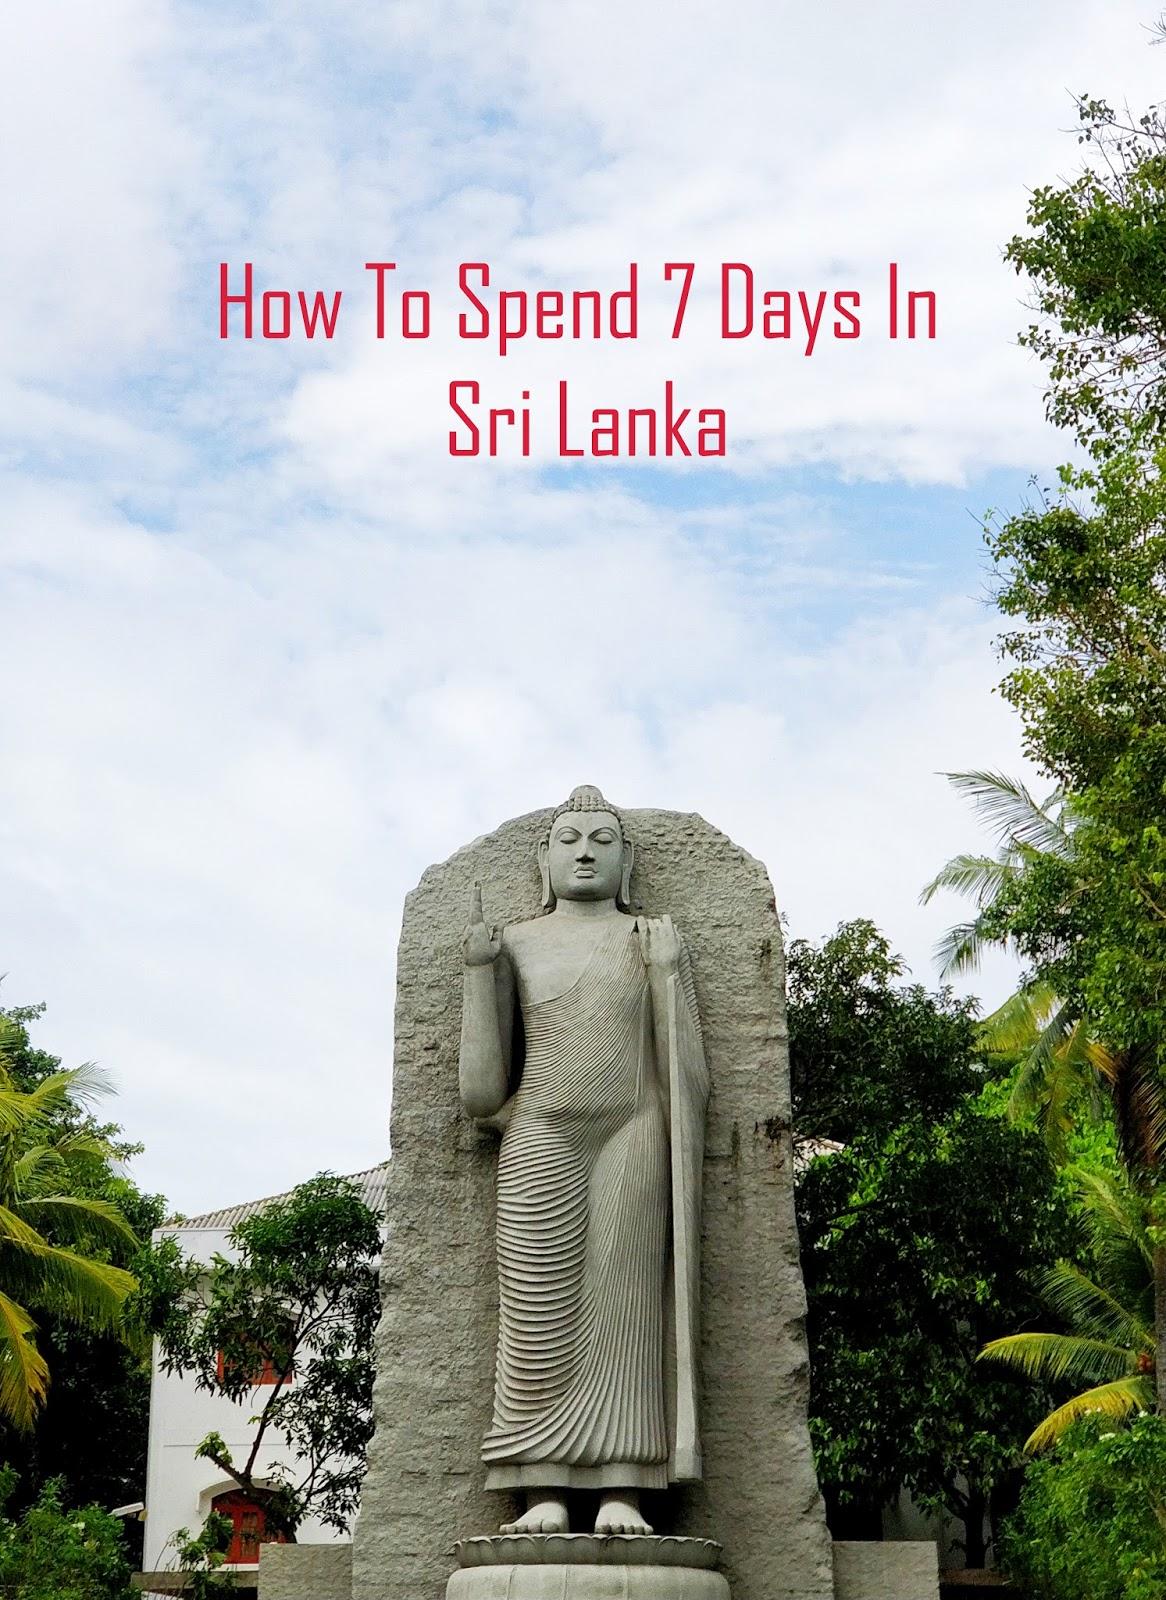 Buddha Statue at city center, Colombo, Sri Lanka